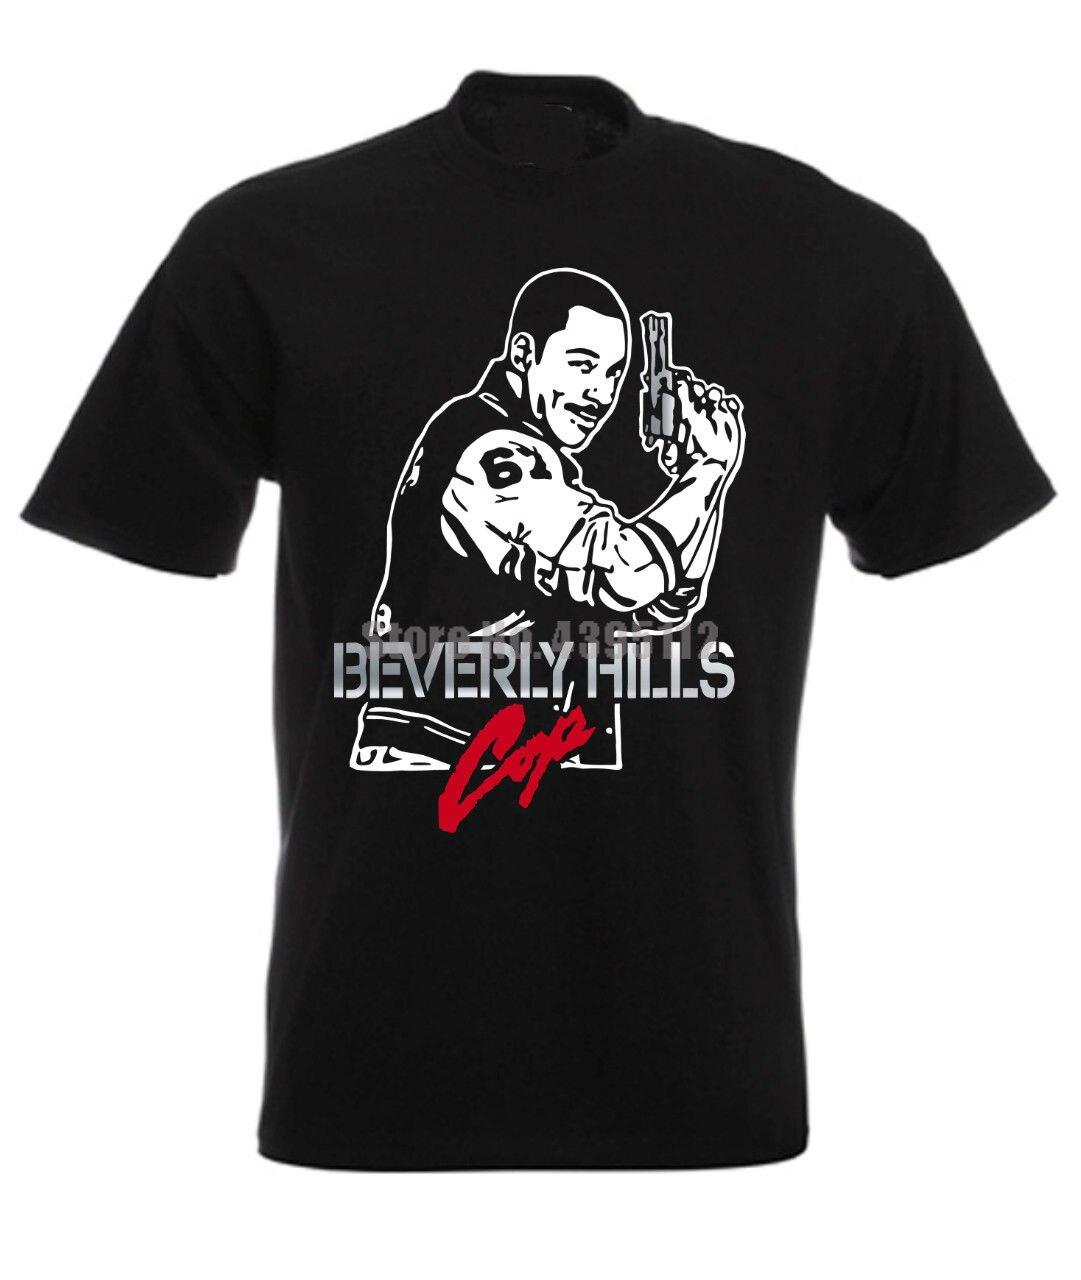 Beverly Hills Cop Eddie Murphy Axel Foley Retro Movie Men'S Tshirts Harajuku Top Tee Shirt Fashion 2019 T-Shirt Custom